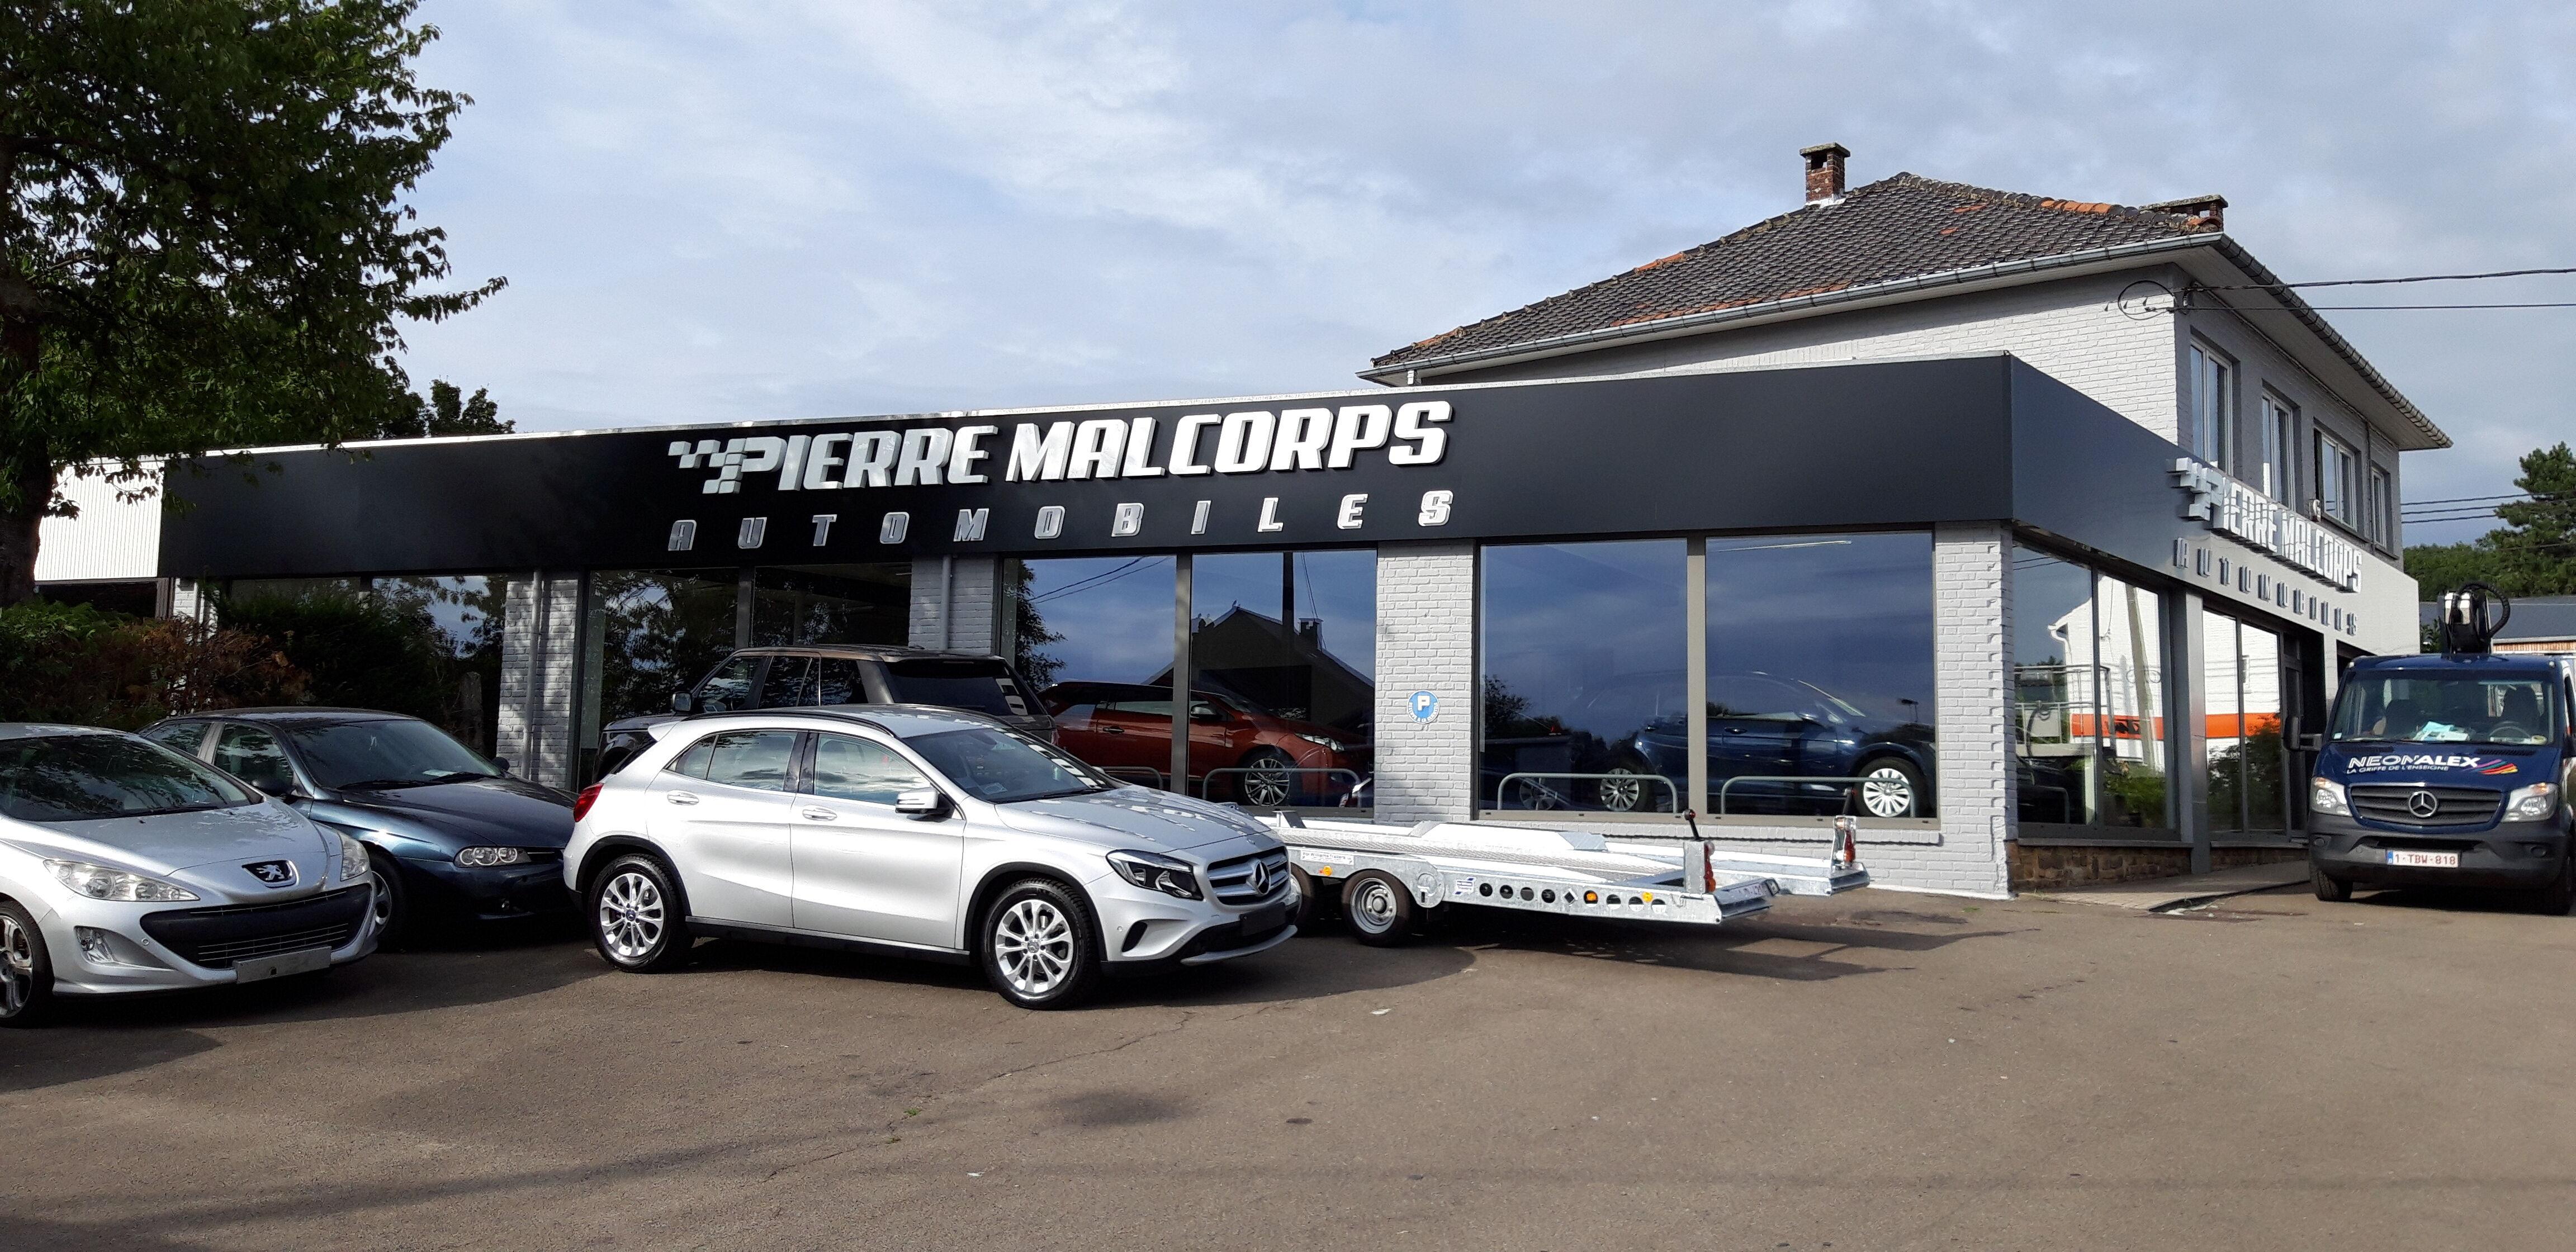 Pierre Malcorps Automobiles